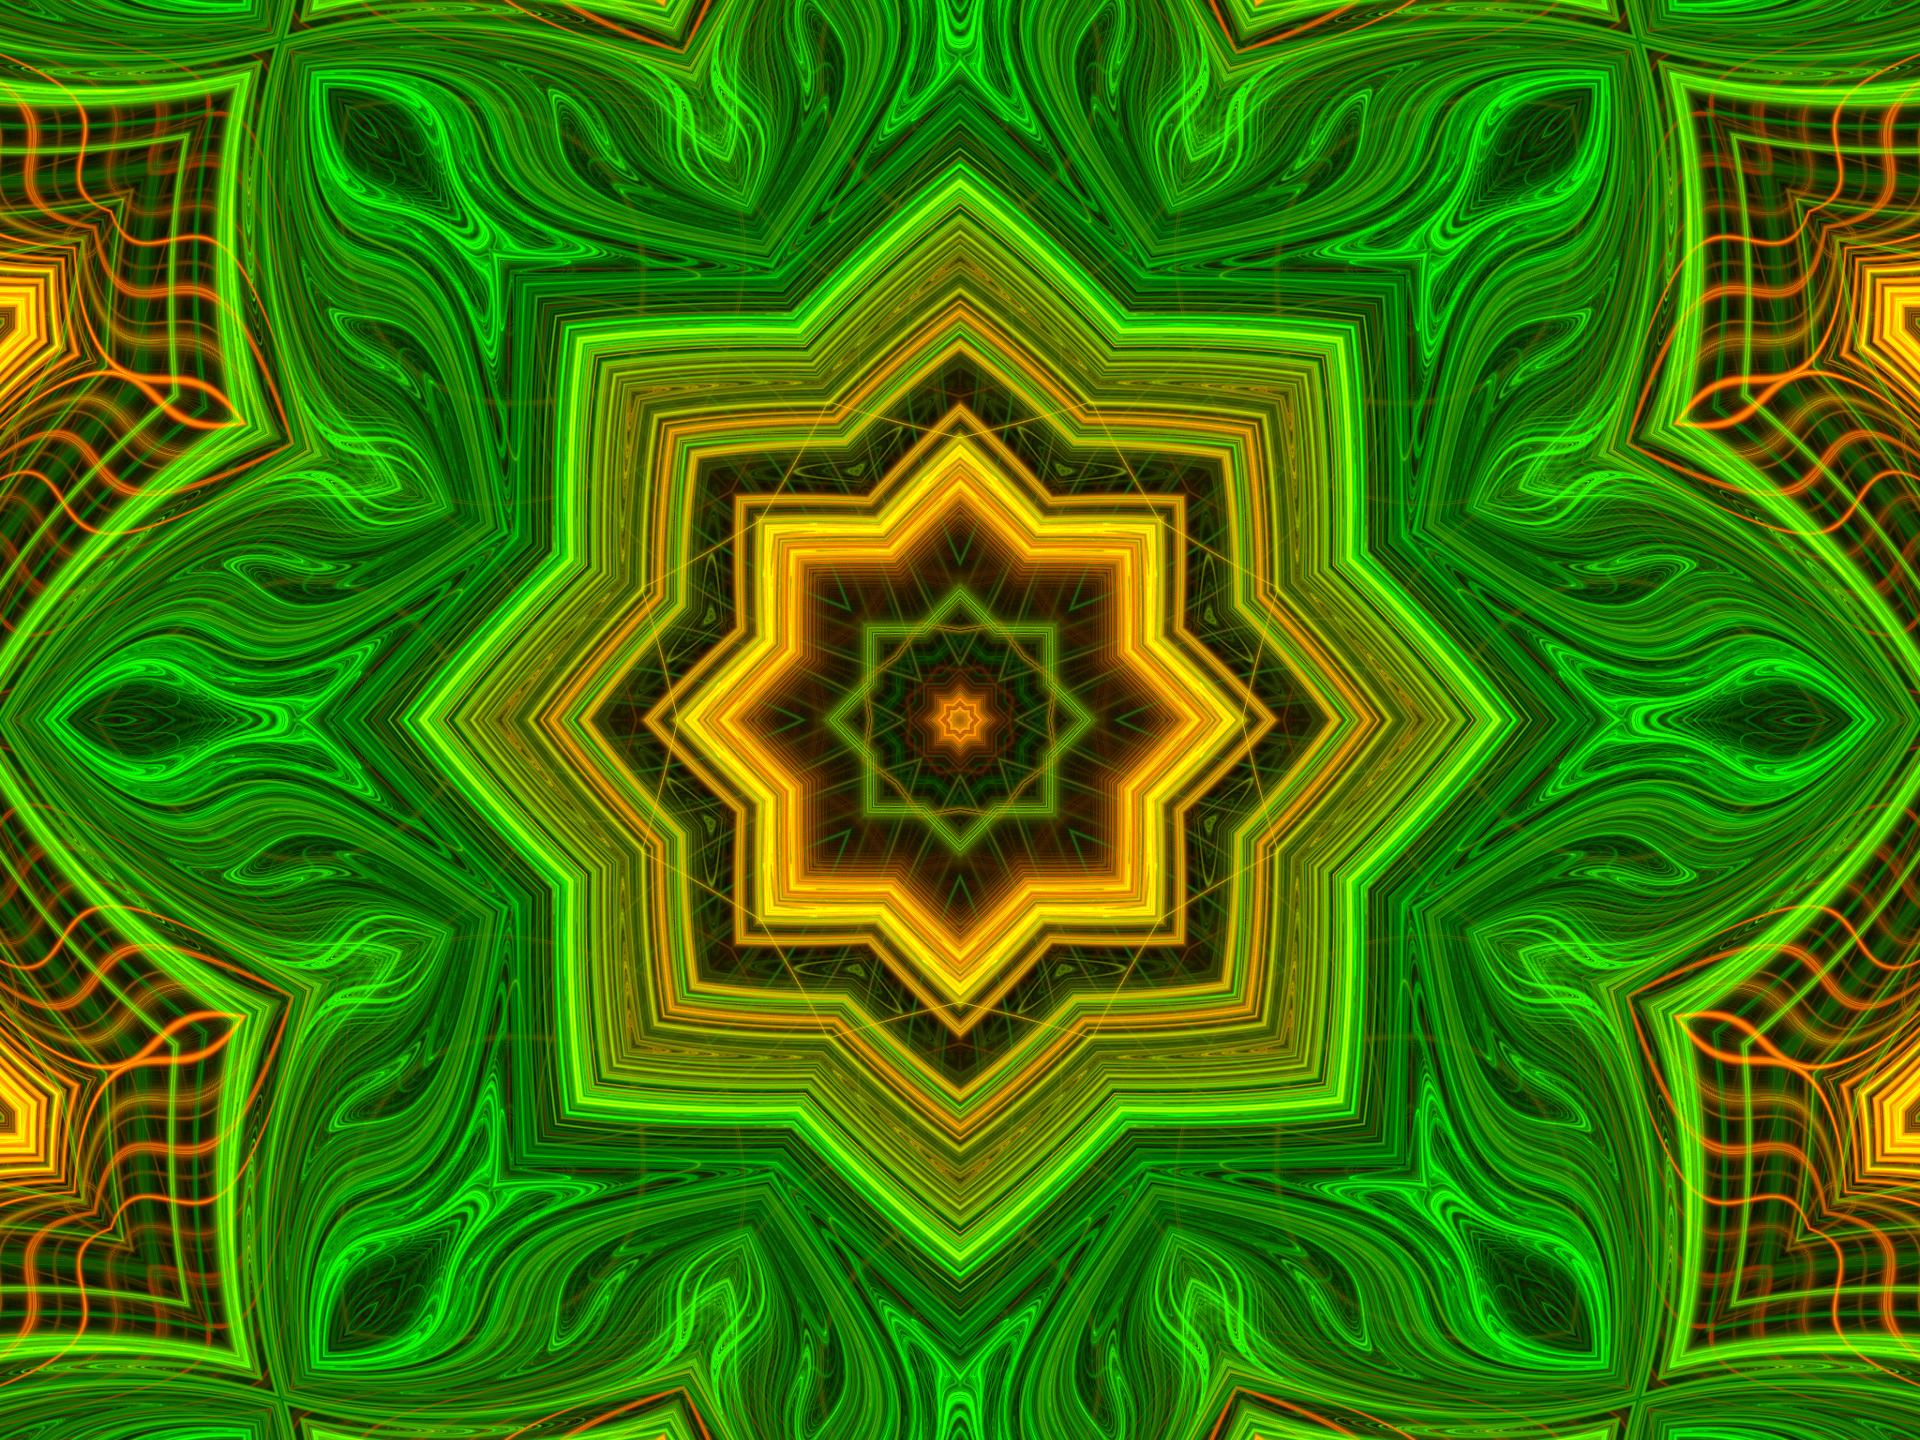 Artistic Digital Art Colors Pattern Green 1920x1440